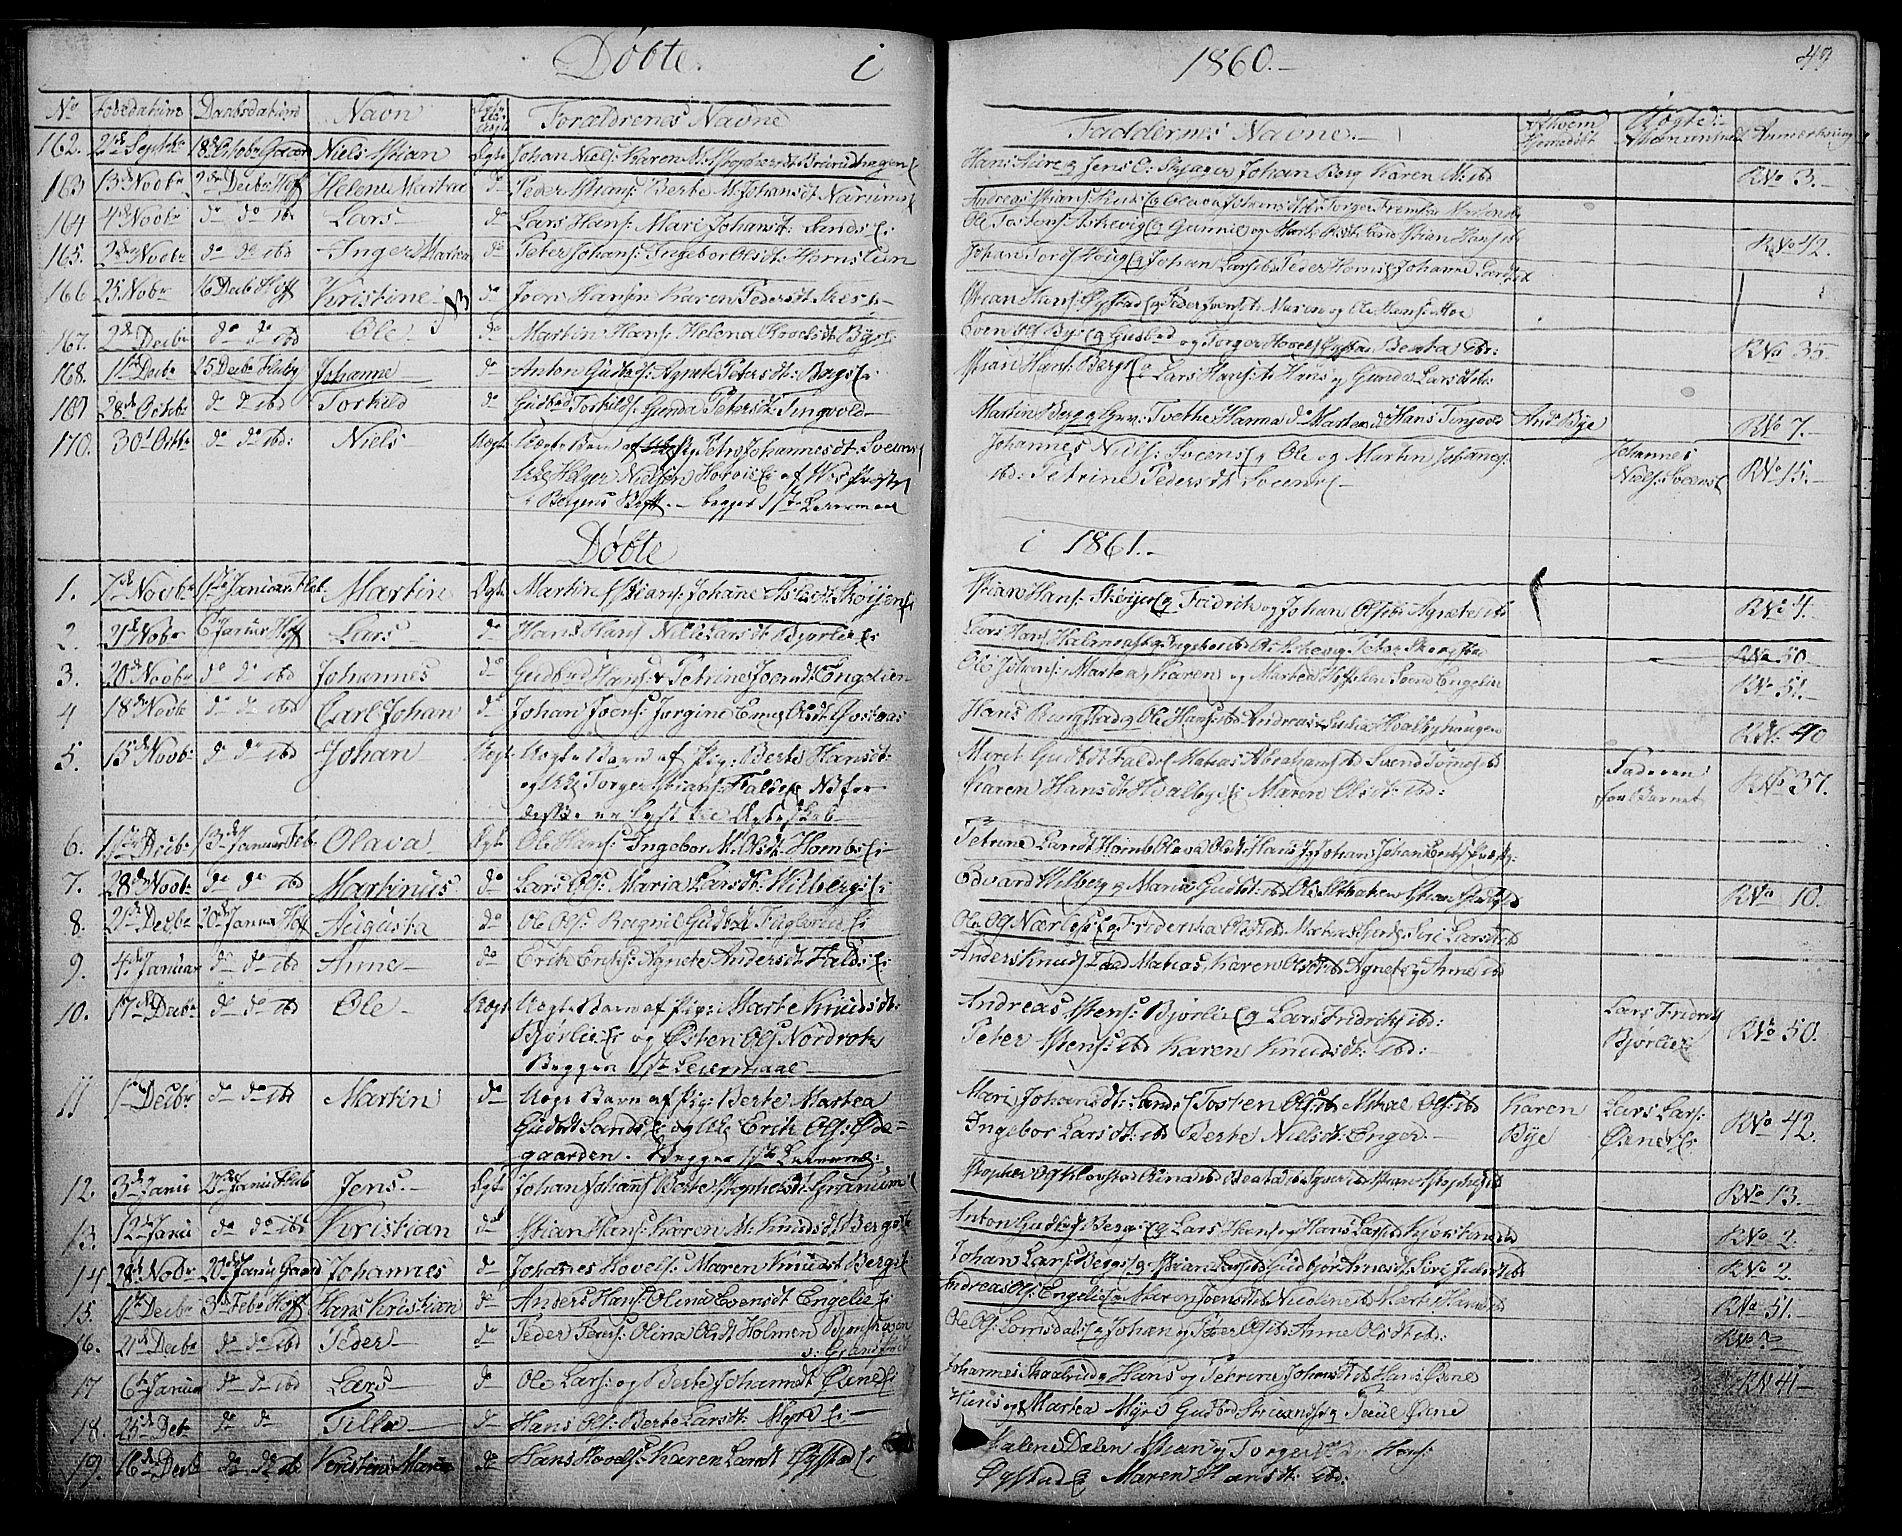 SAH, Søndre Land prestekontor, L/L0001: Klokkerbok nr. 1, 1849-1883, s. 49